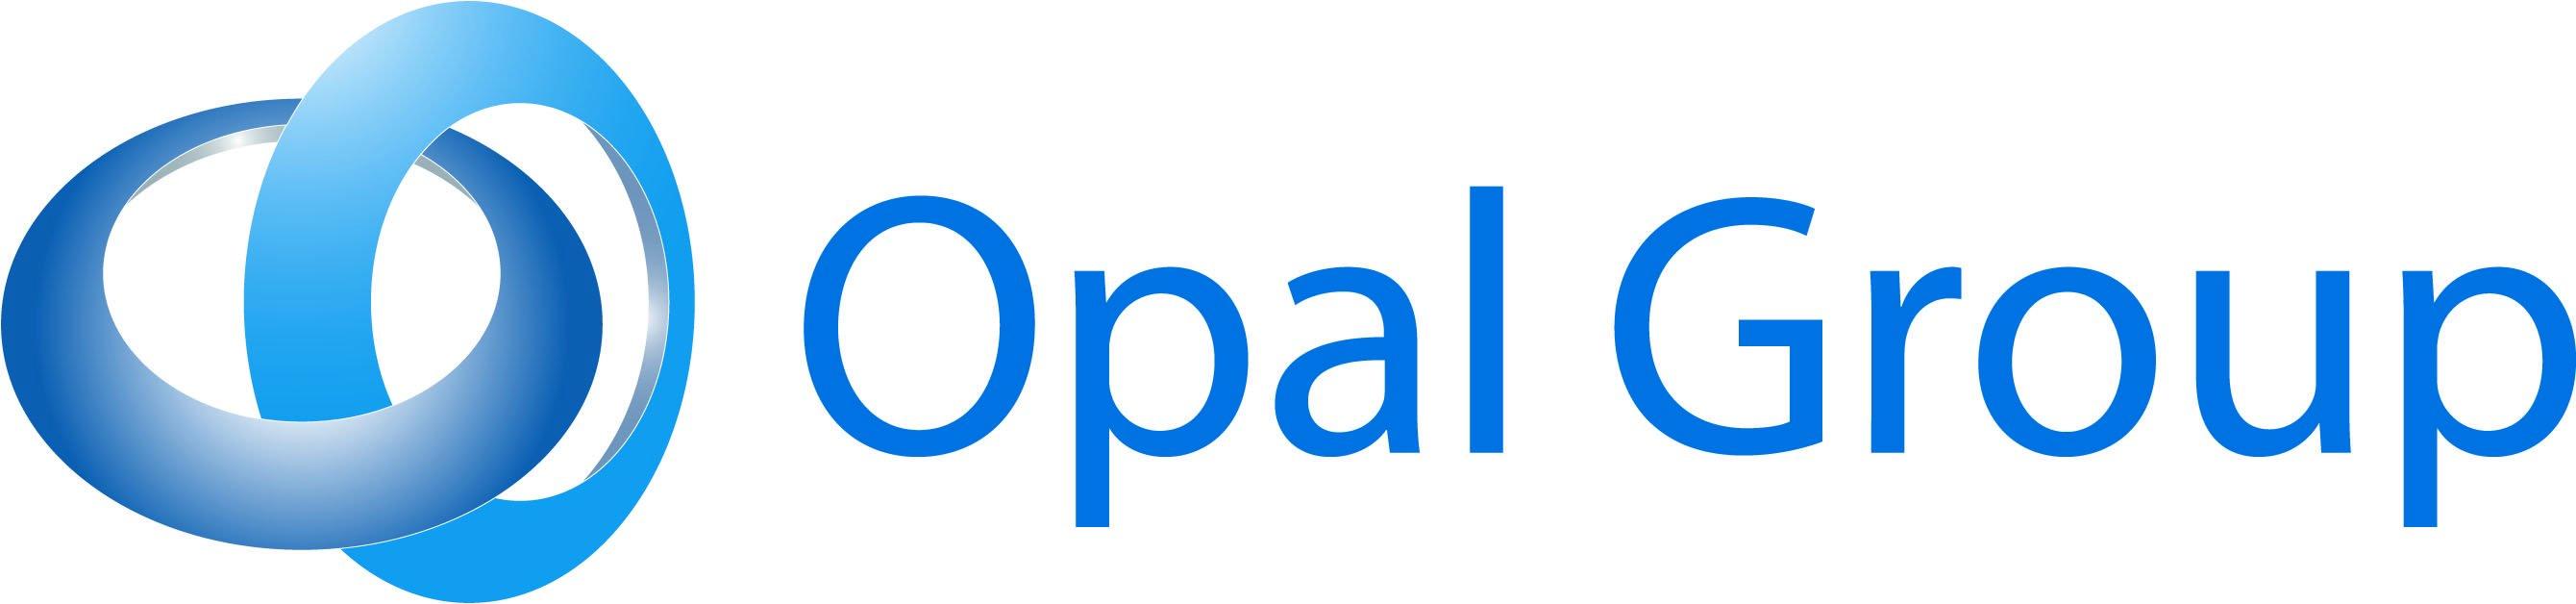 https://www.fintrx.com/hubfs/chub_backup/Opal-Group-CMYK.jpg